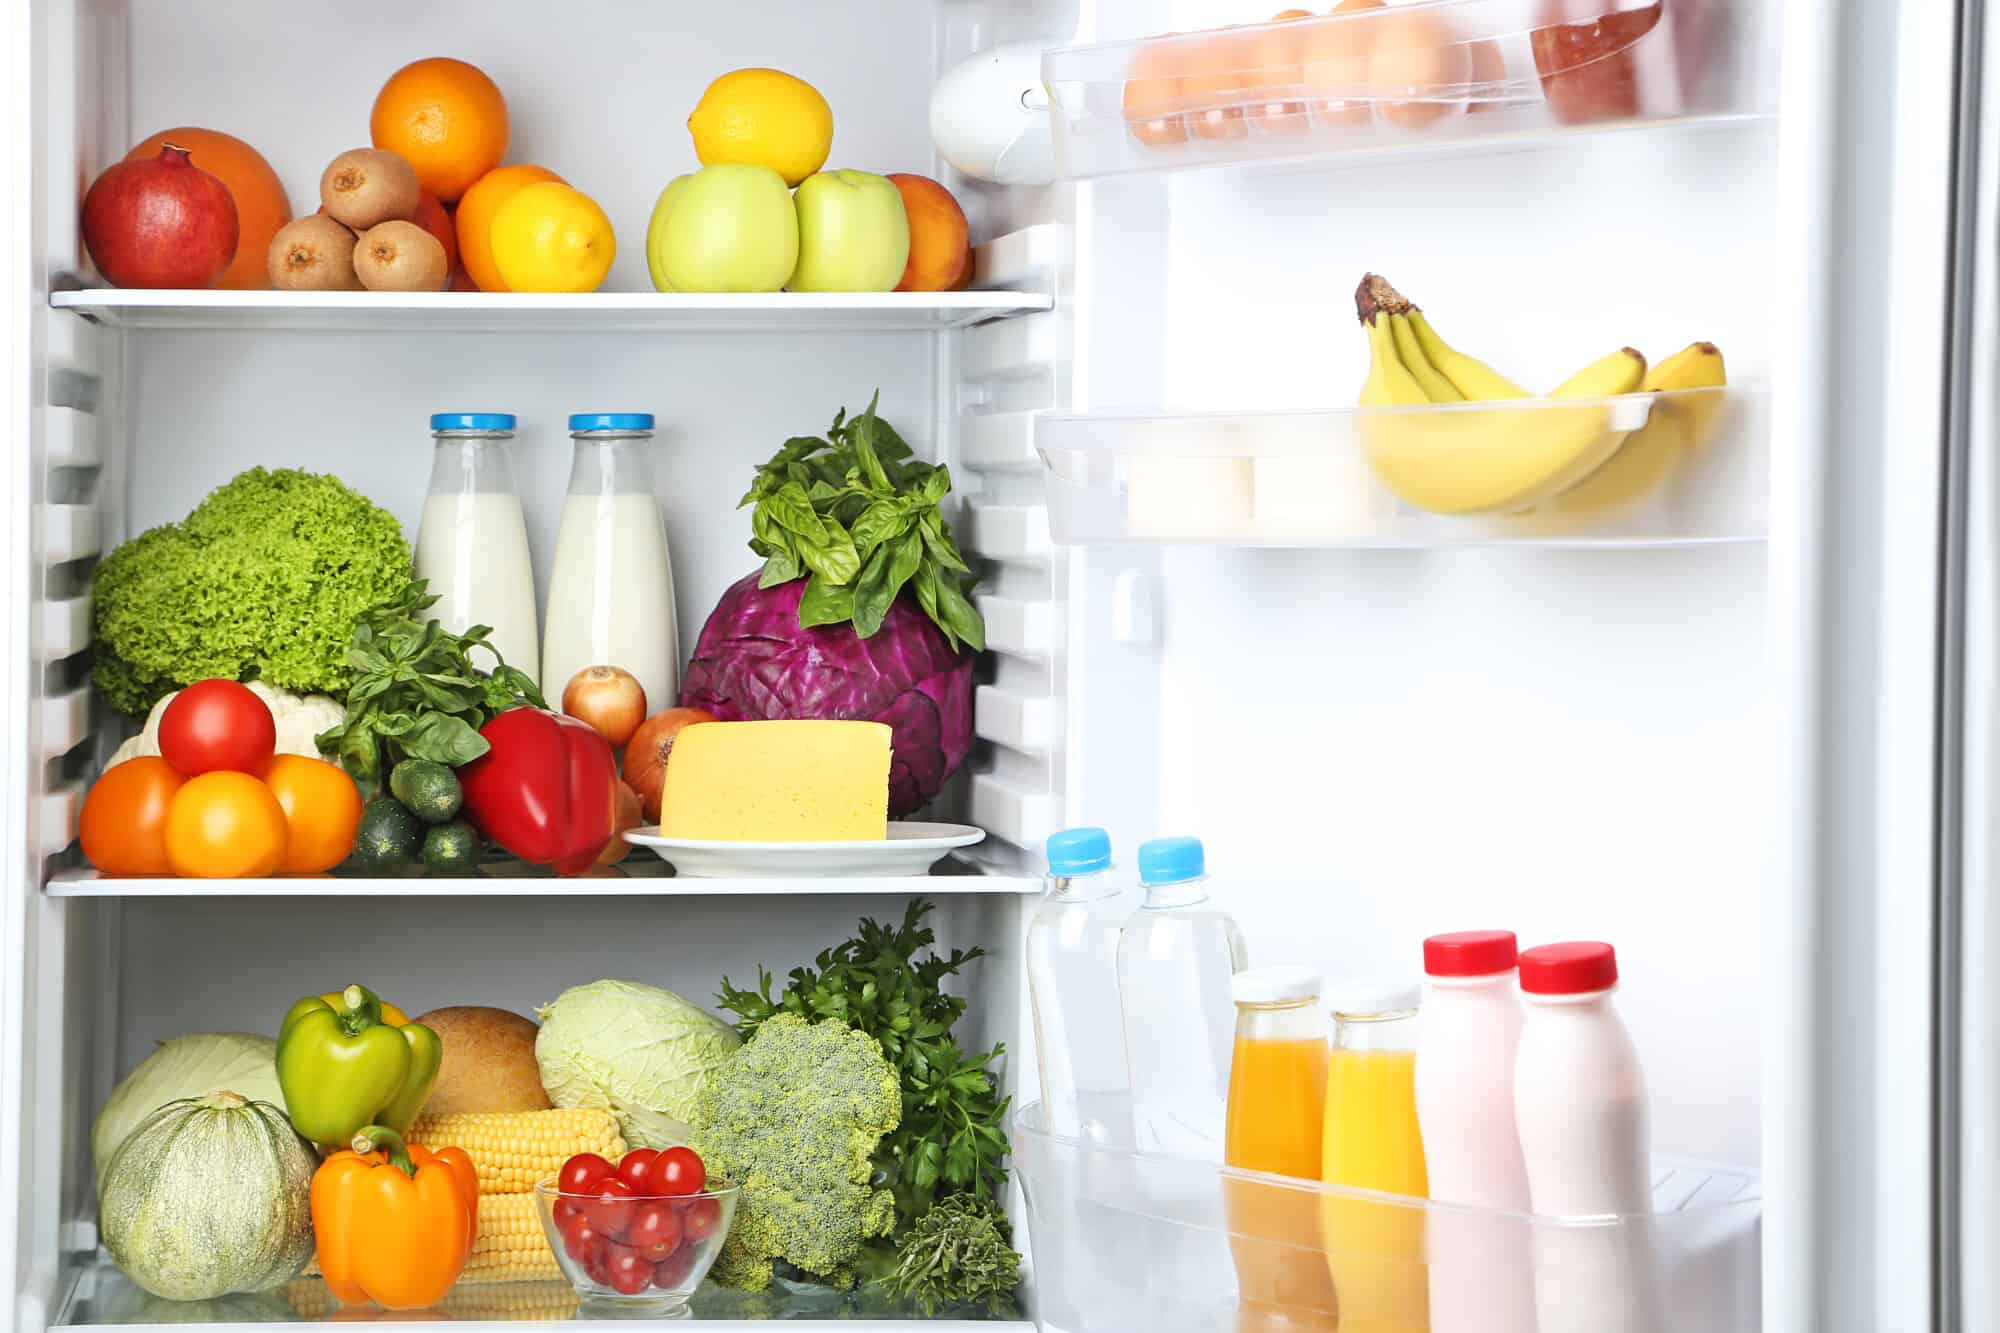 refrigerator organization ideas